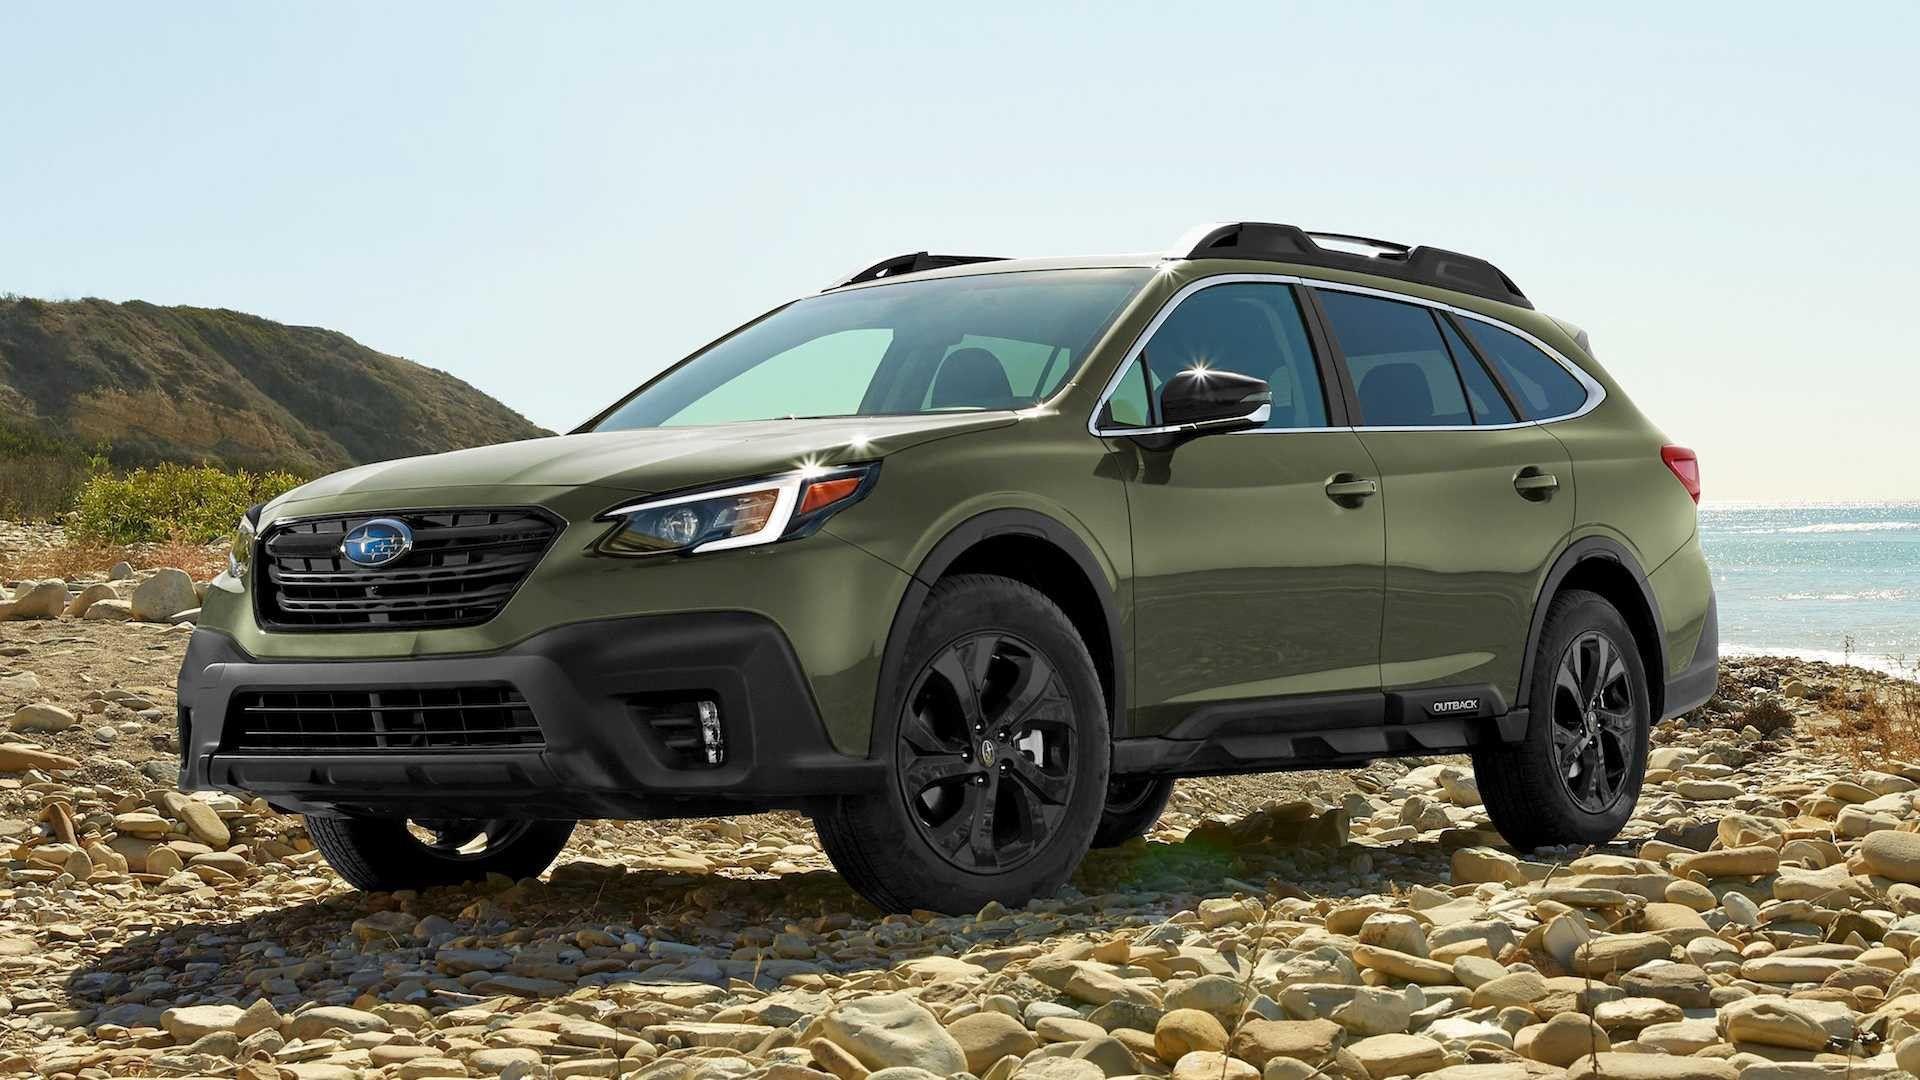 New Generation 2020 Subaru Outback Rumor In 2020 Subaru Outback Subaru Subaru Wrx